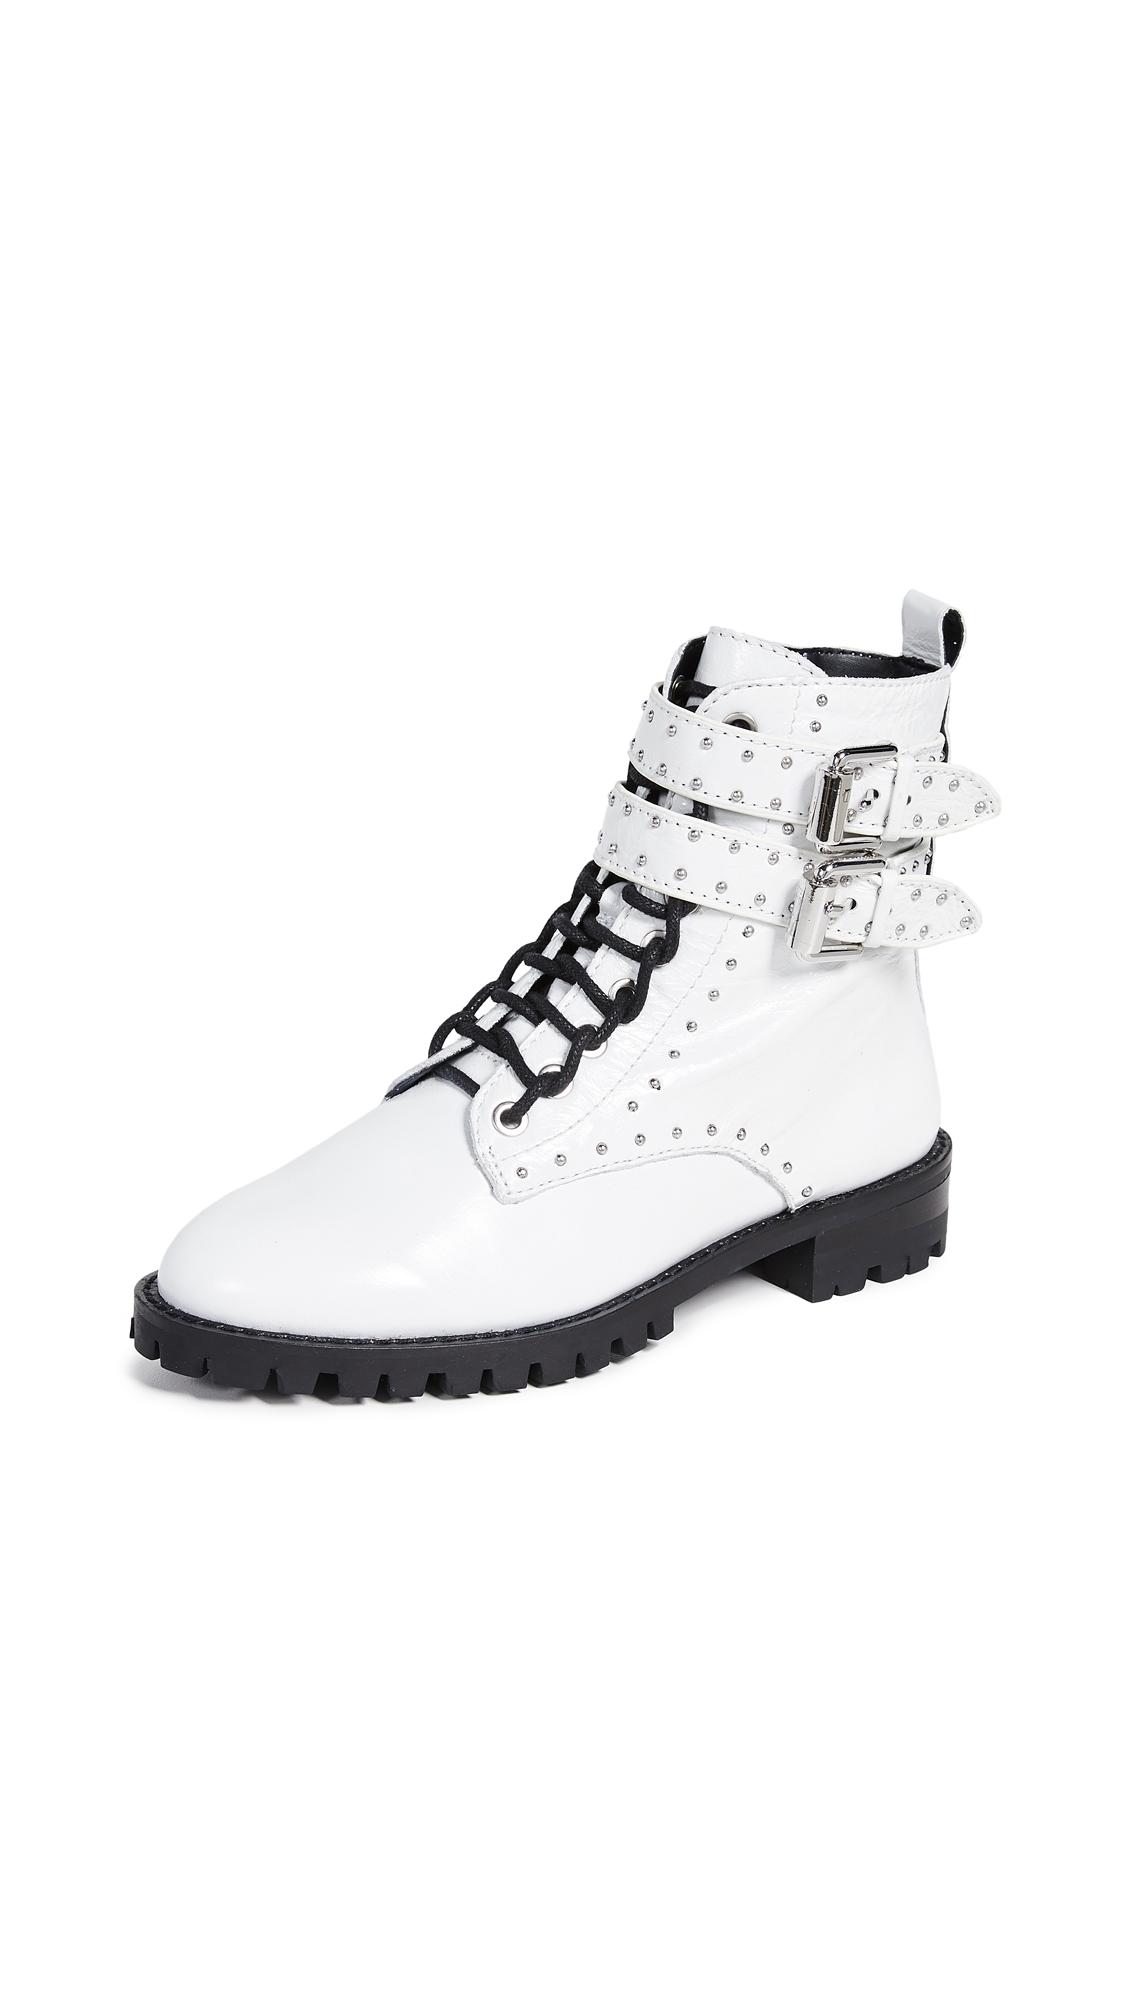 Rebecca Minkoff Jaiden Stud Combat Boots - White